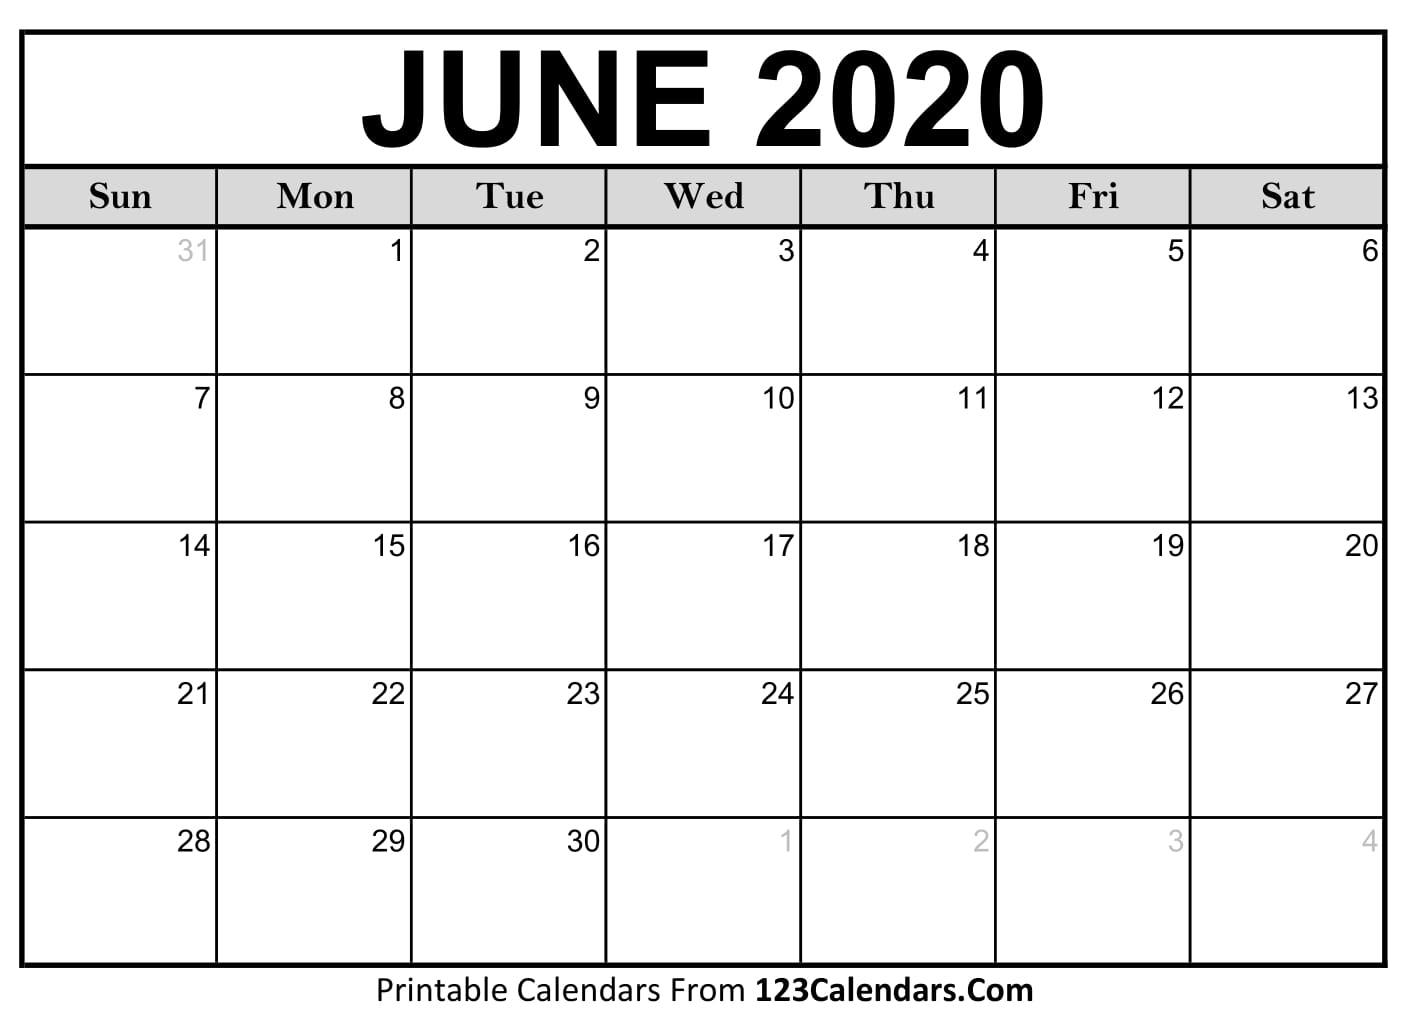 Free June 2020 Calendar | 123Calendars